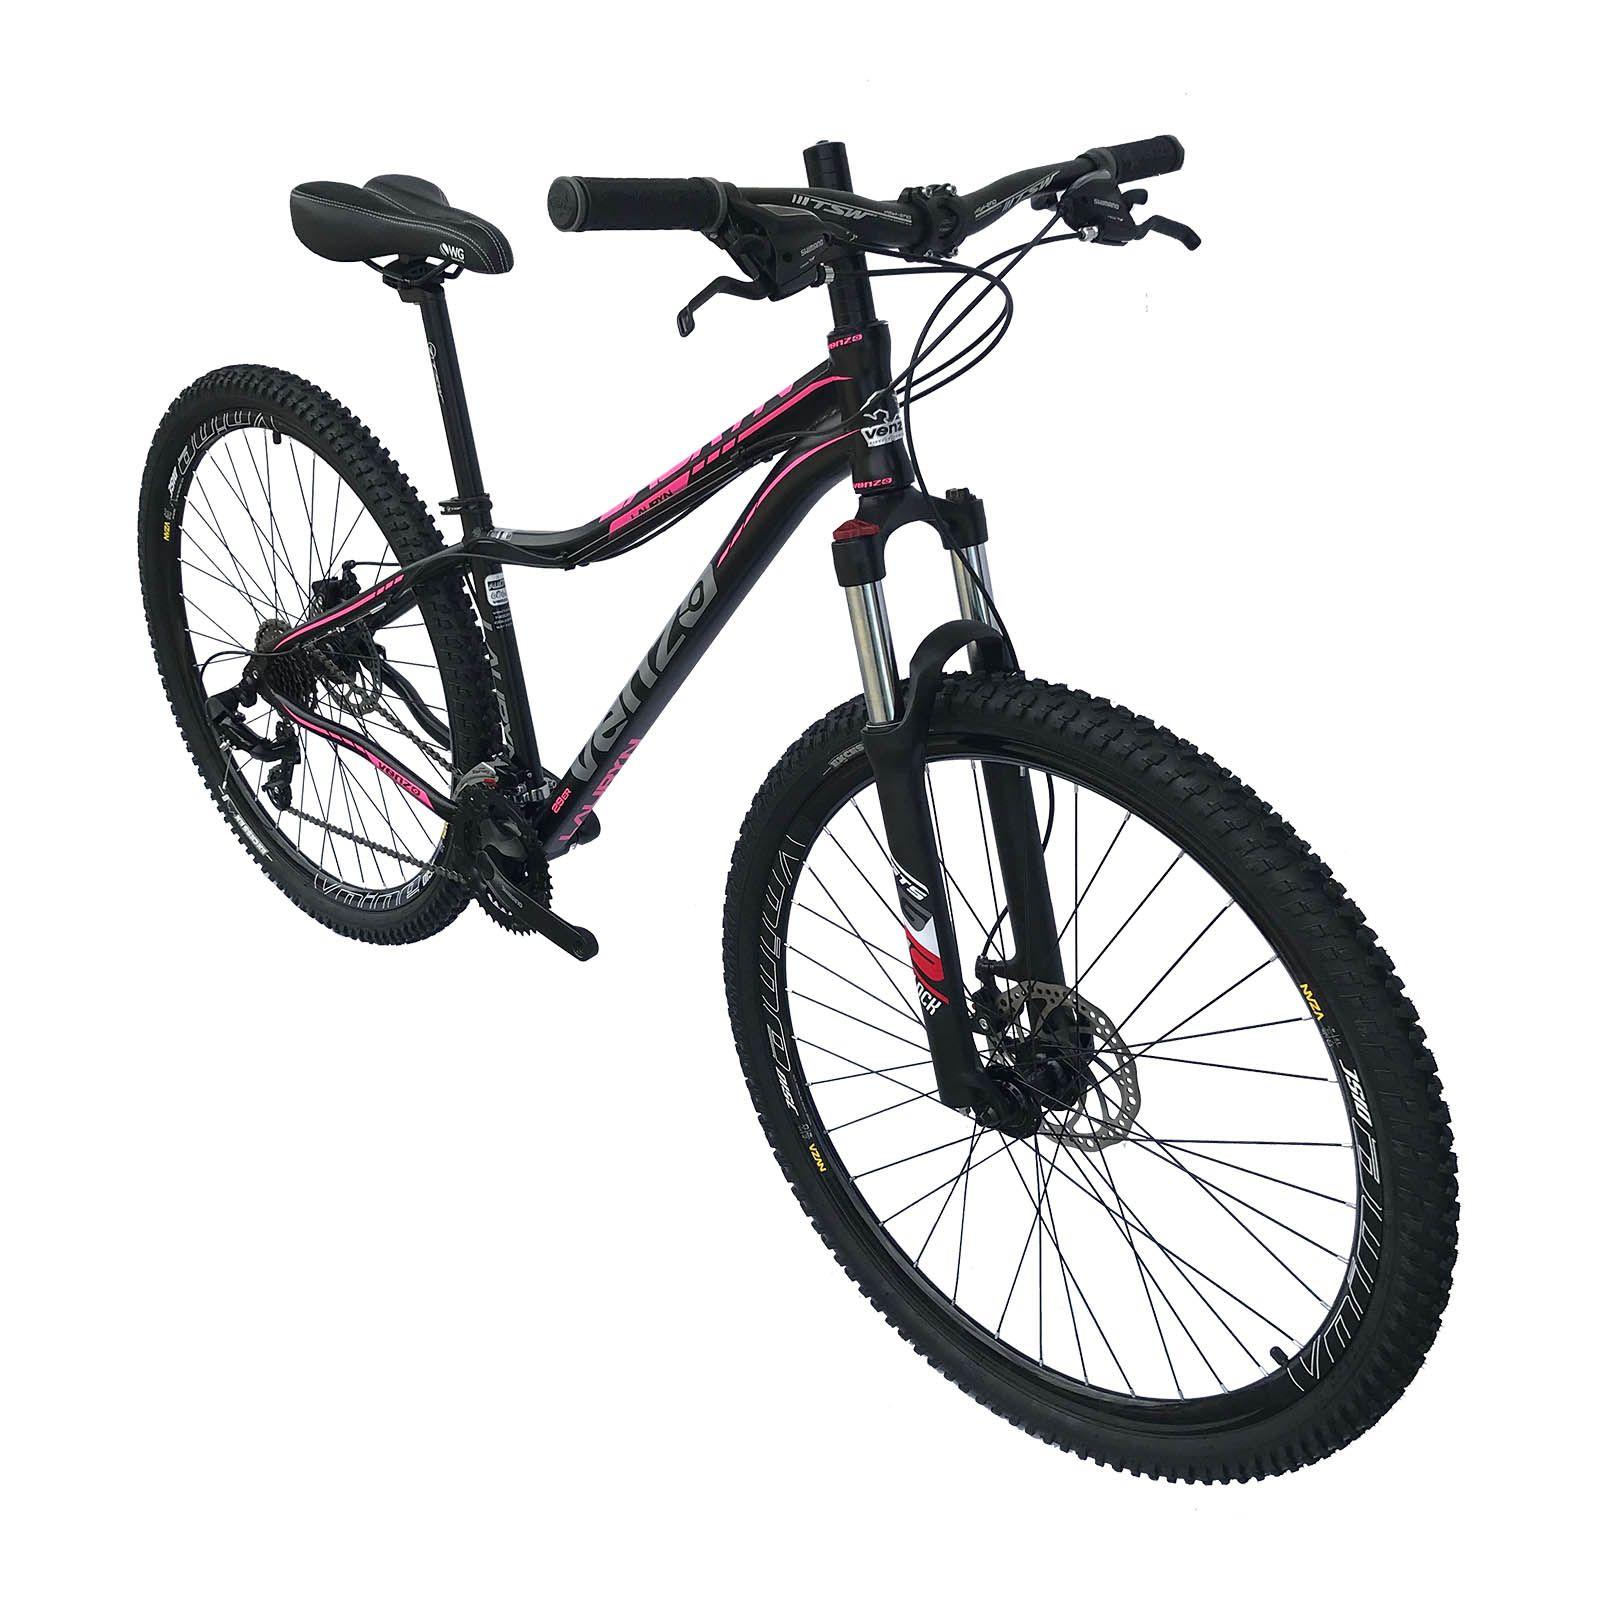 Bicicleta Feminina Aro 29 Lauryn Venzo 24v Shimano Freio a Disco Susp Trava Ombro